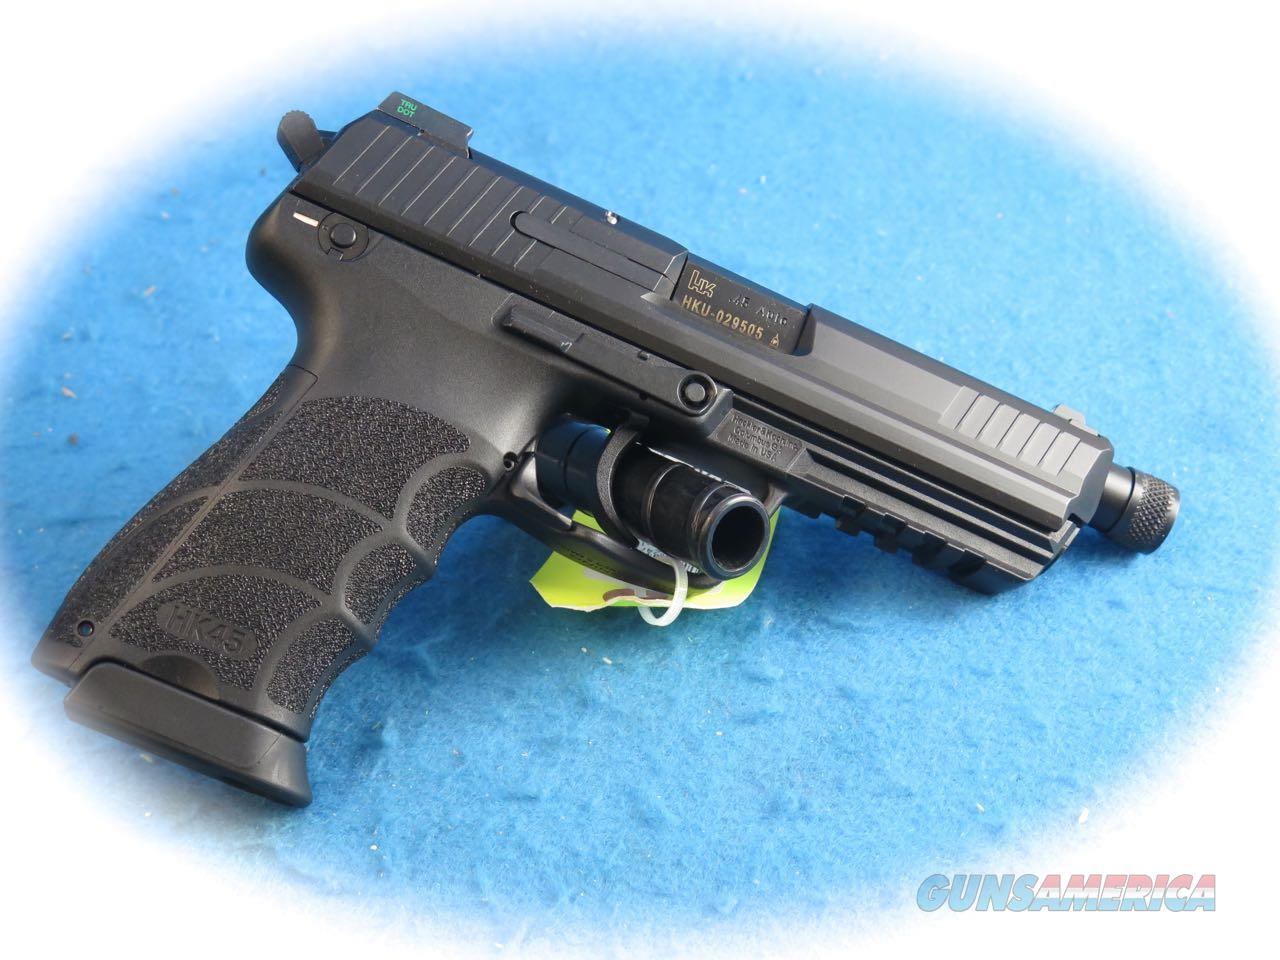 **SALE** Heckler & Koch HK45 Tactical Semi Auto Pistol with TB **New**  Guns > Pistols > Heckler & Koch Pistols > Polymer Frame